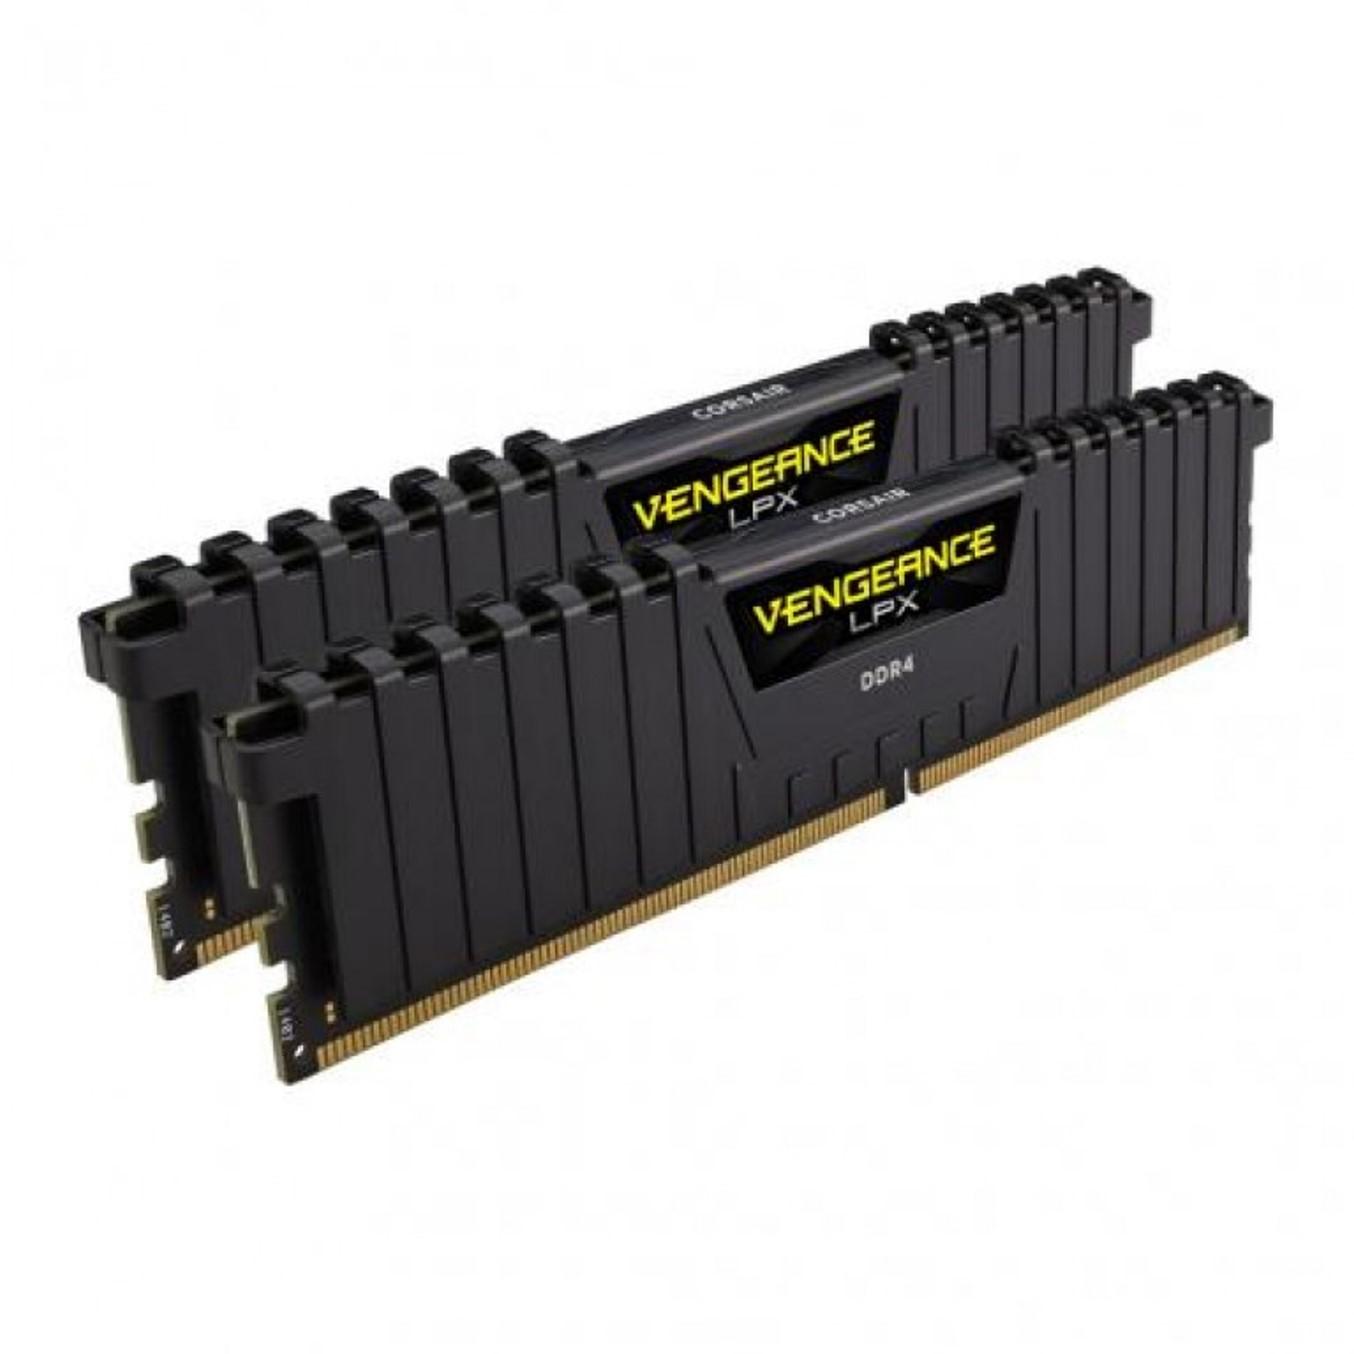 MEMORIA DDR4 16GB KIT 2X8 CORSAIR VENGEANCE